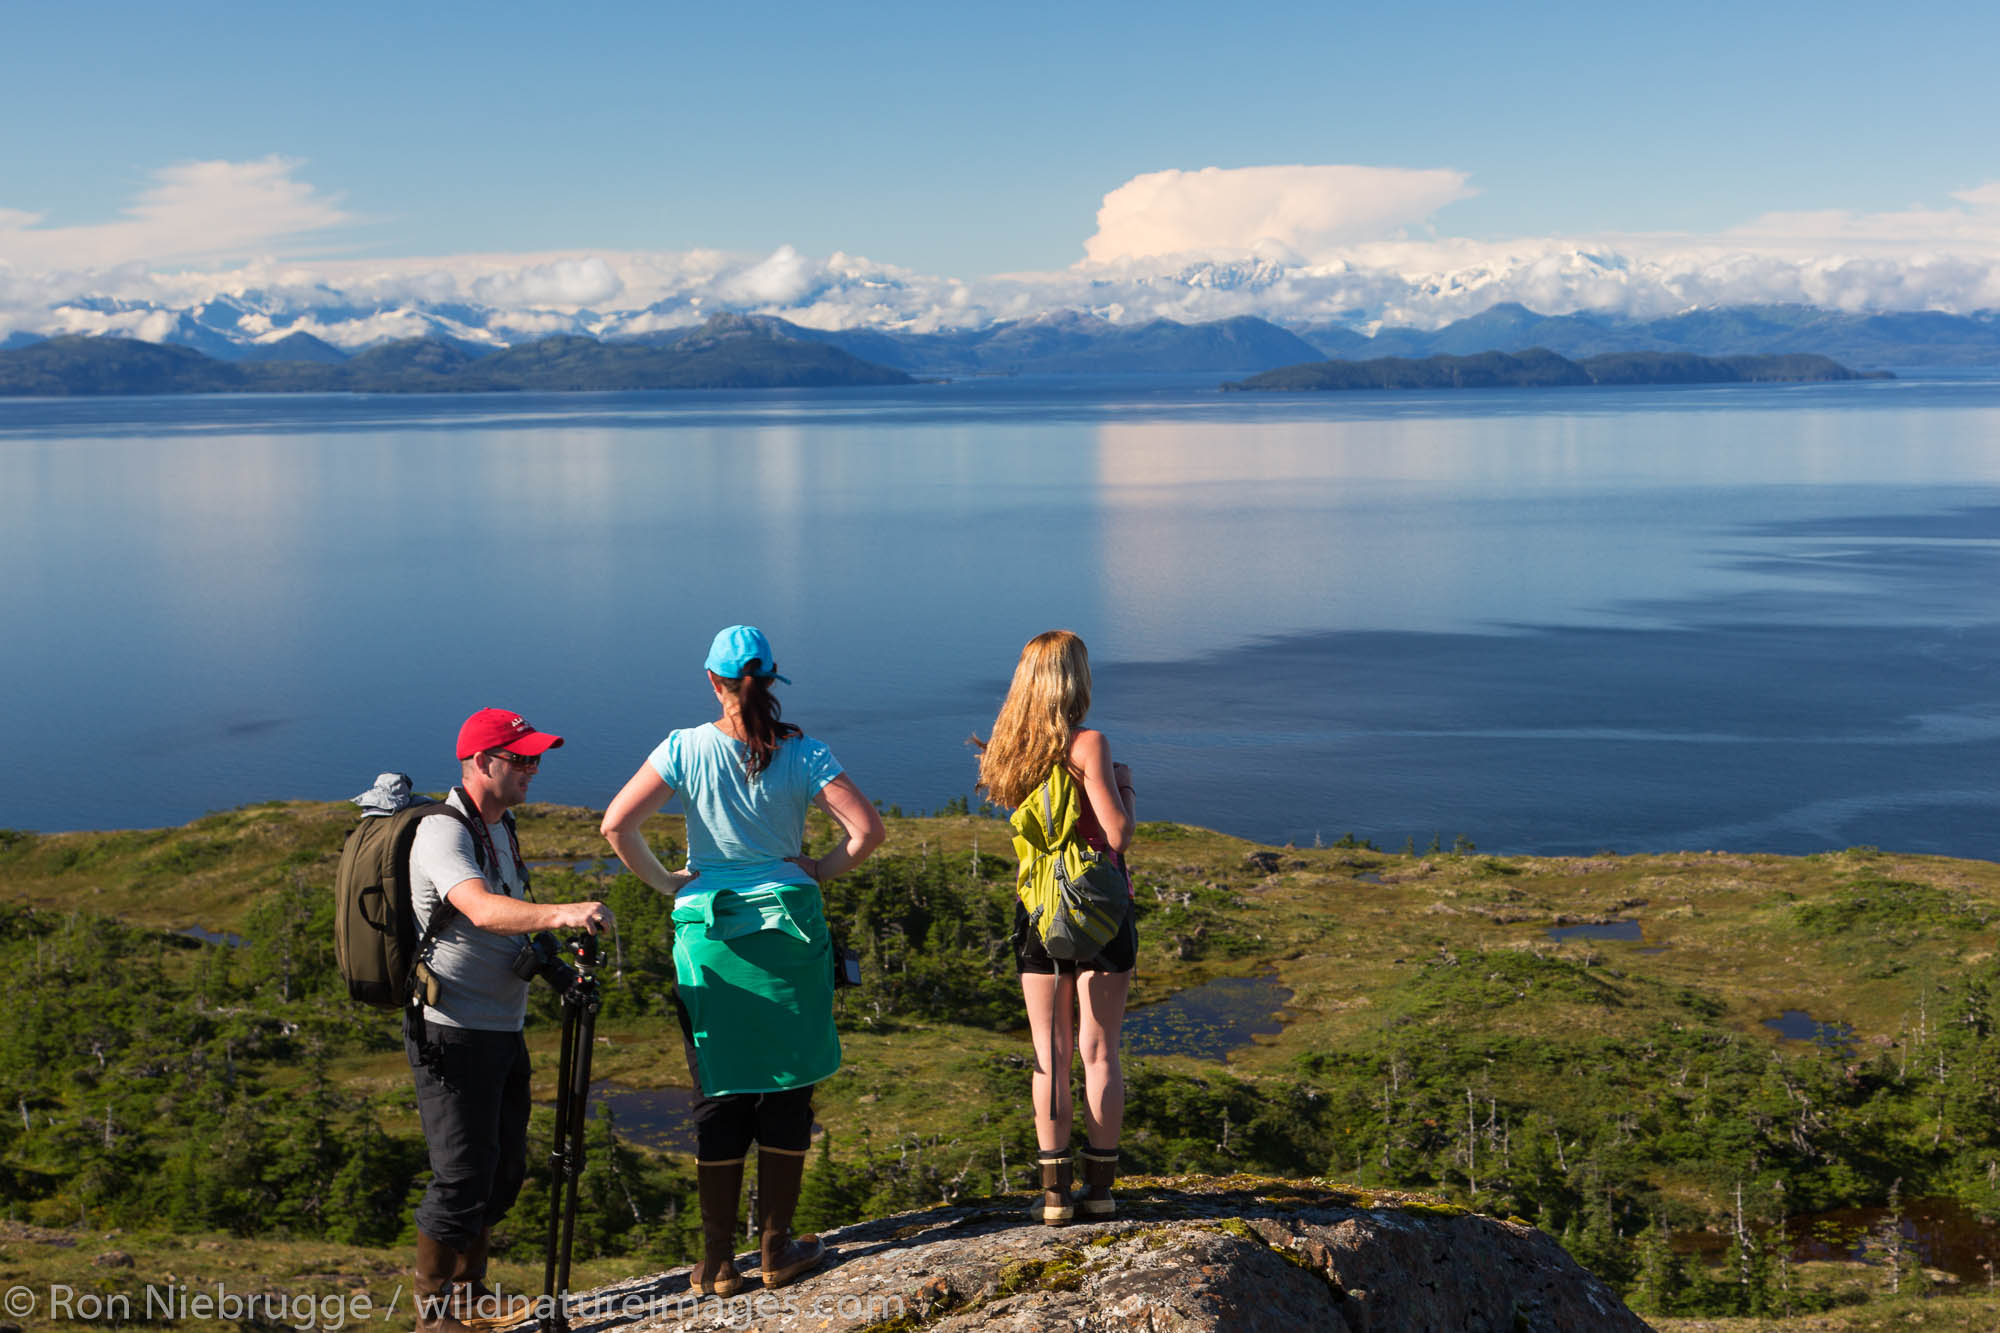 Hiking on Knight Island, Prince William Sound, Chugach National Forest, Alaska